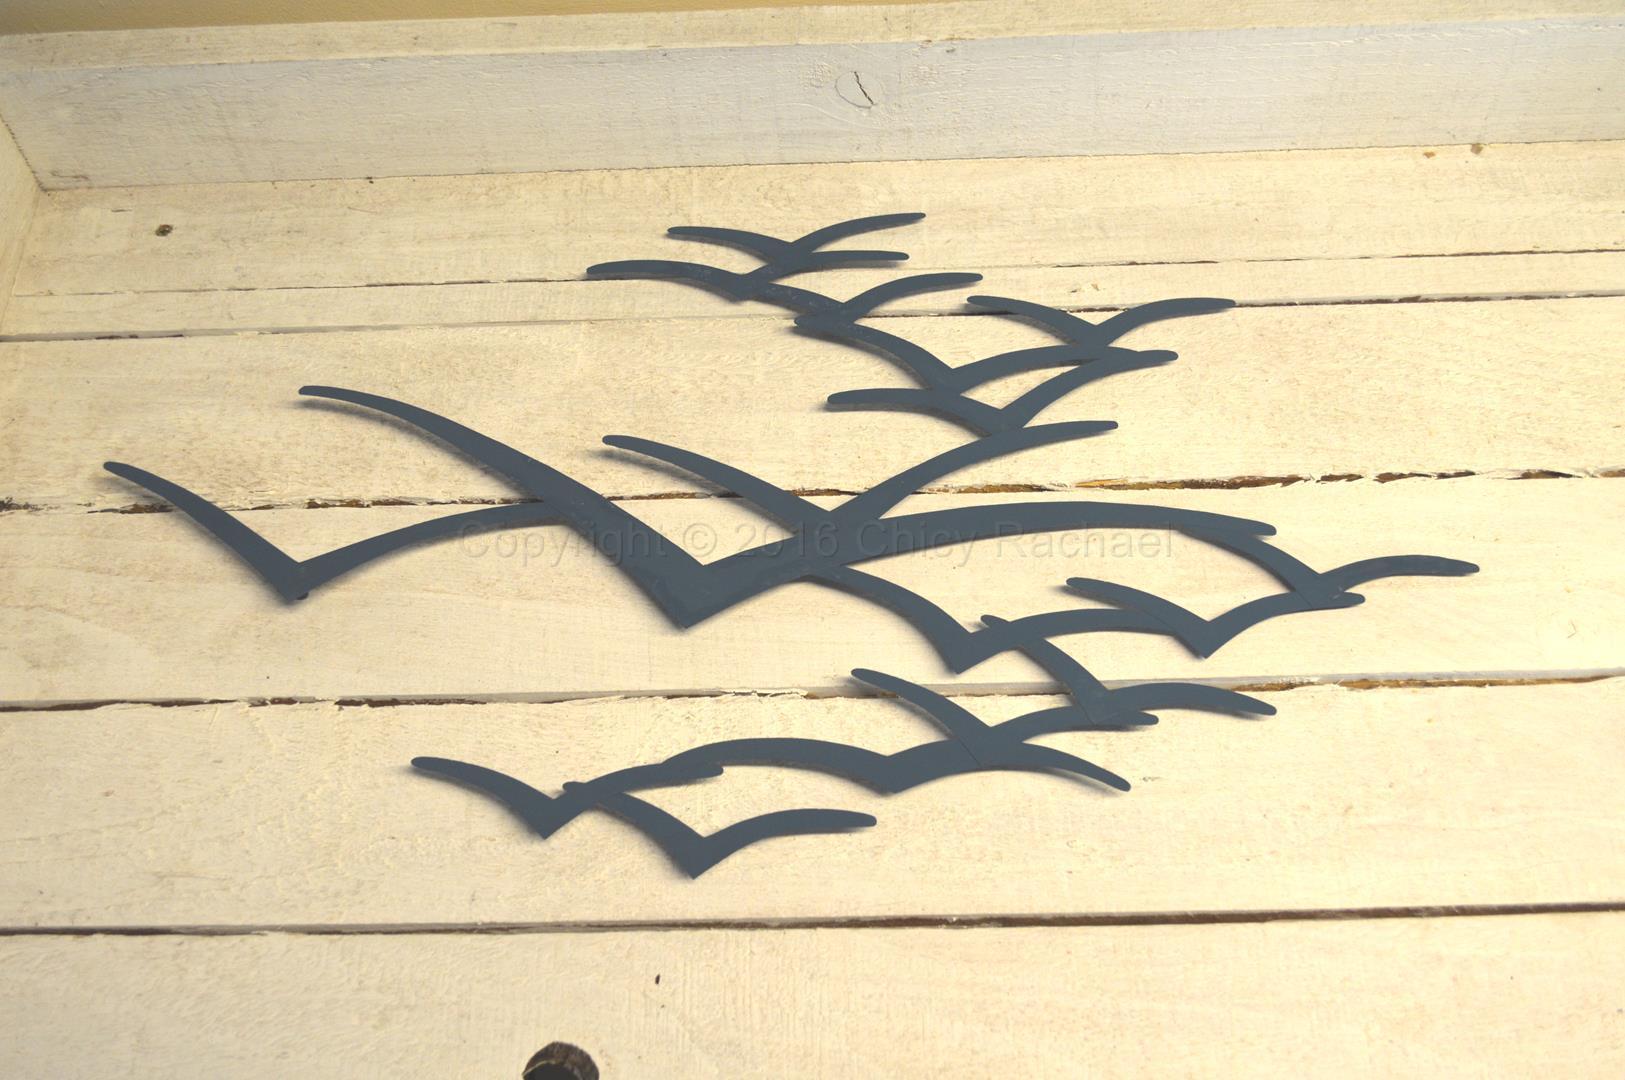 Blue Metal Seagulls In Flight Wall Art - Chicy Rachael